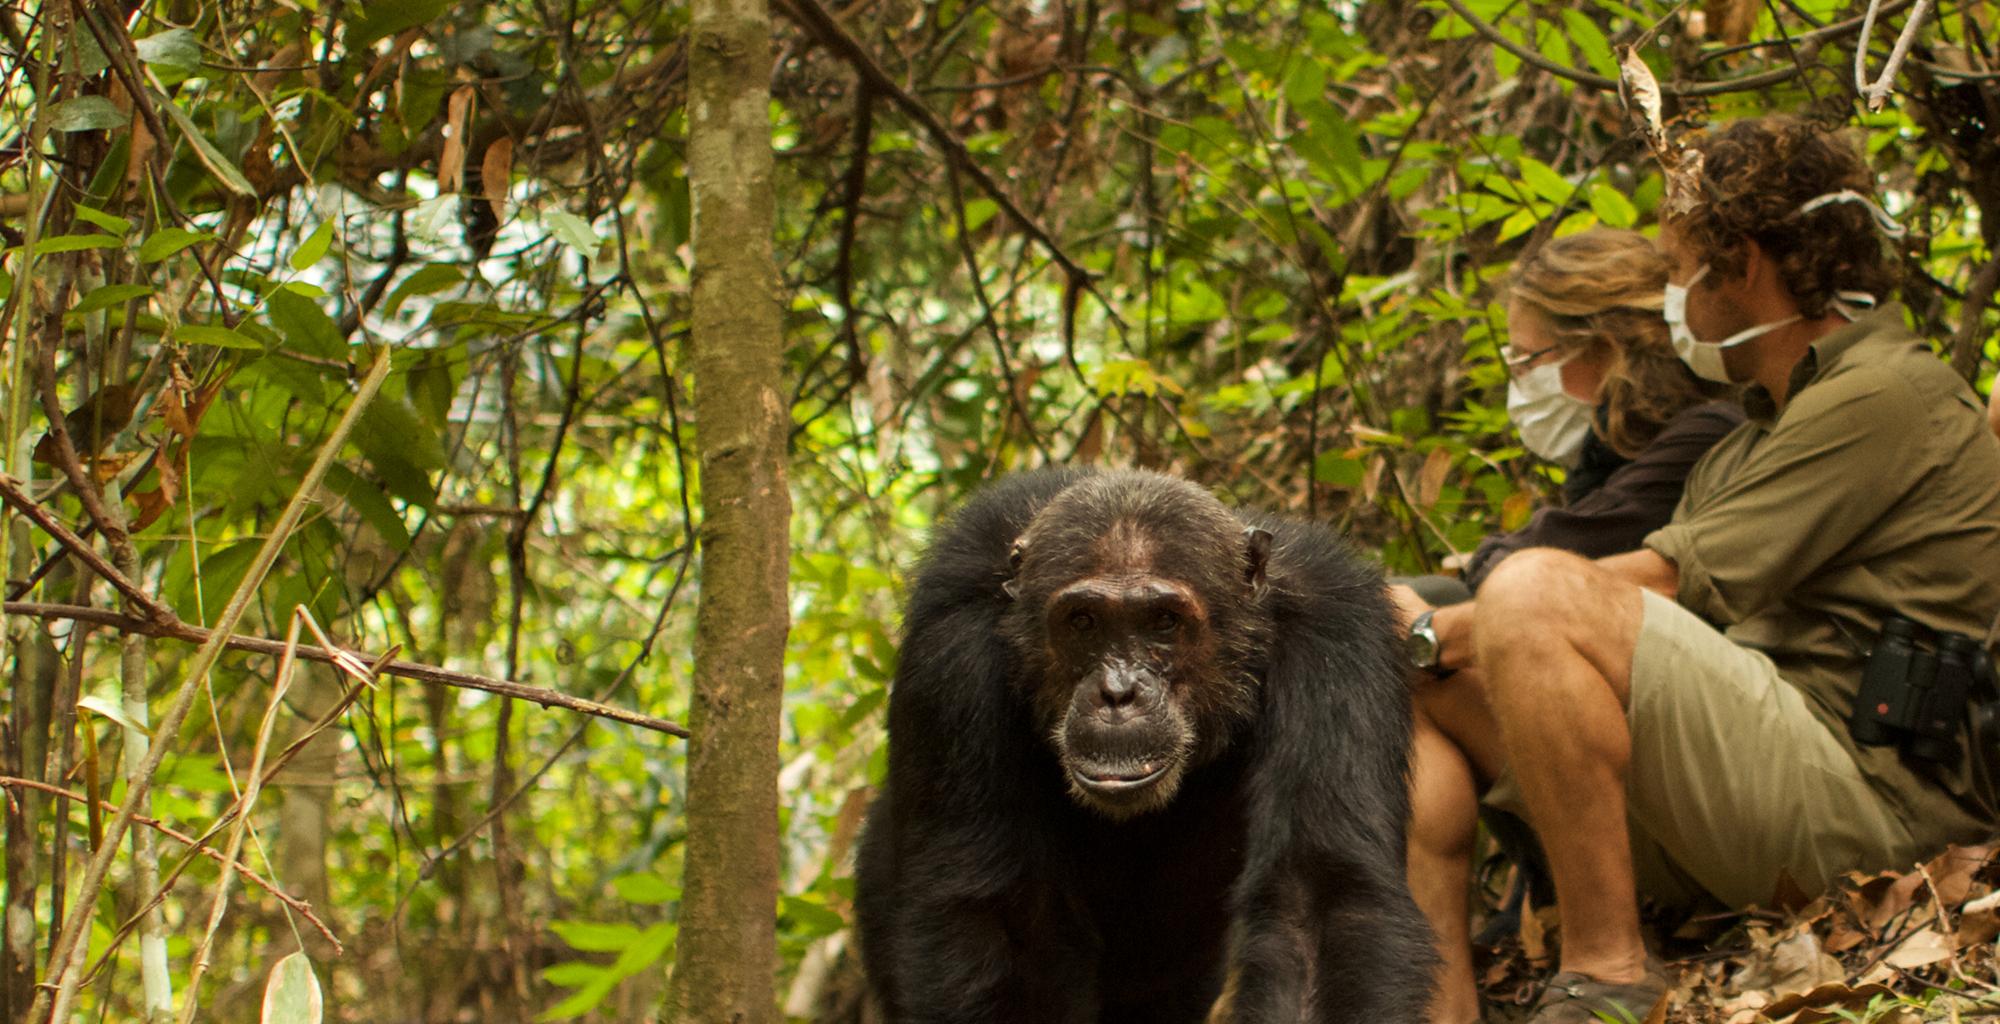 Tanzania-Chimp-Nest-Wildlife-Tracking